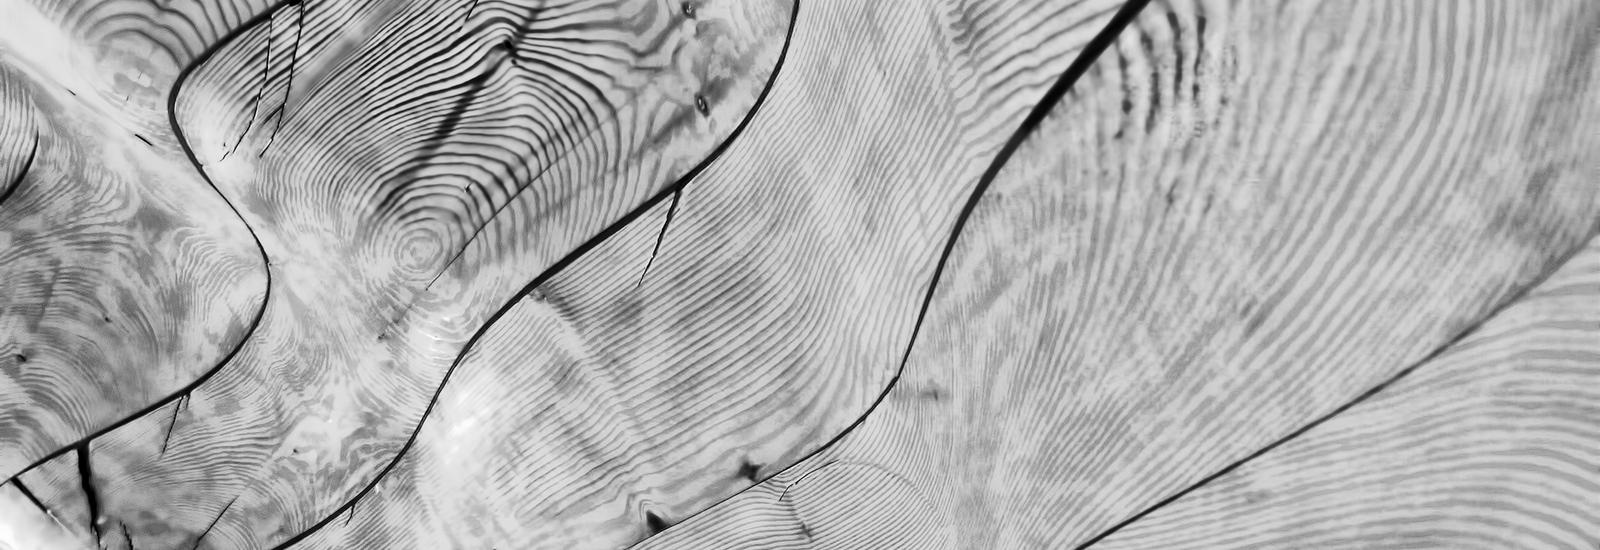 B&W cross section of tree